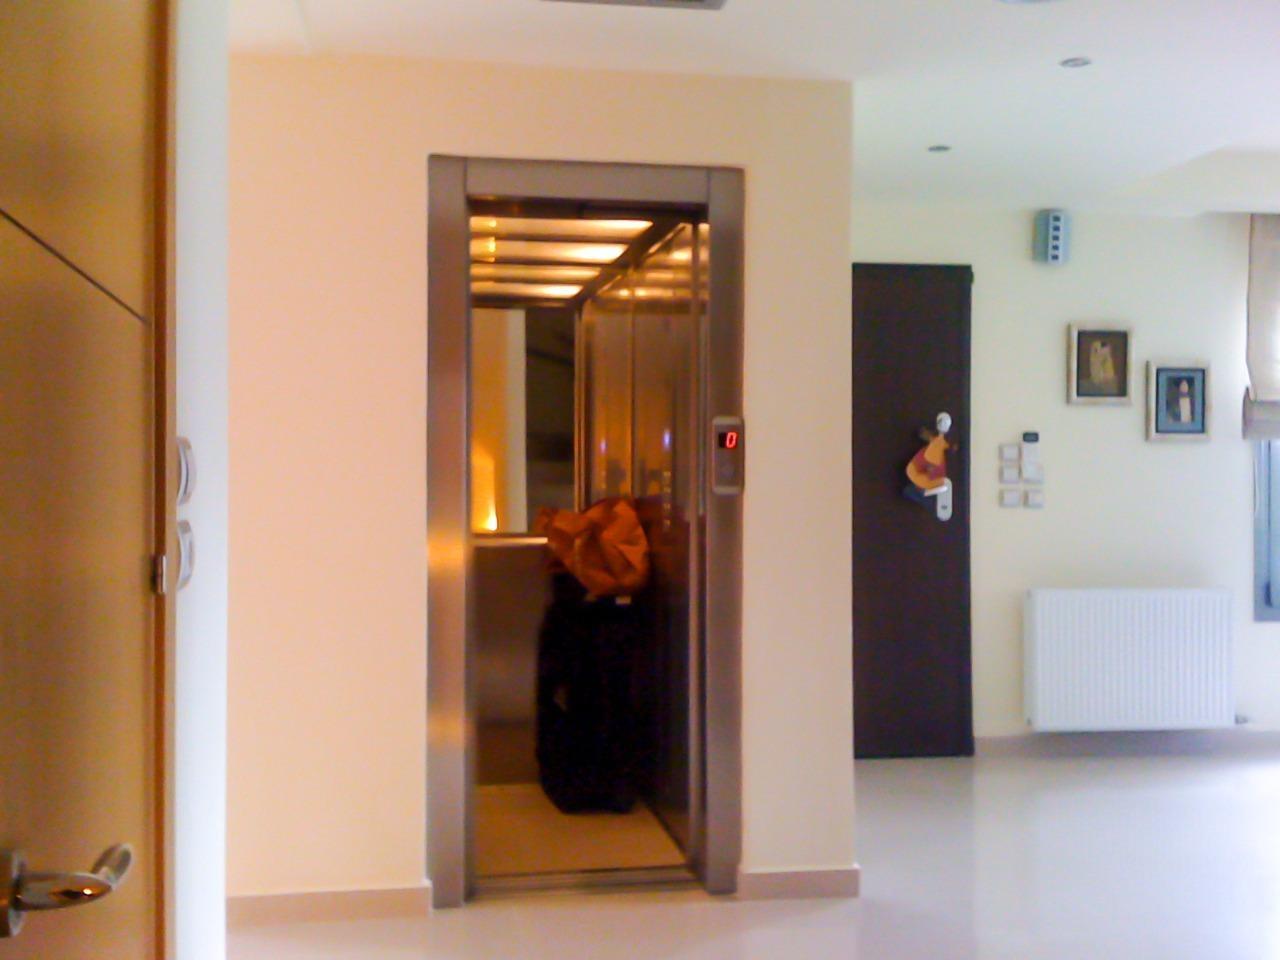 zlift-erga-lifts-21 Εγκατάσταση Ανελκυστήρα - Ρόδος